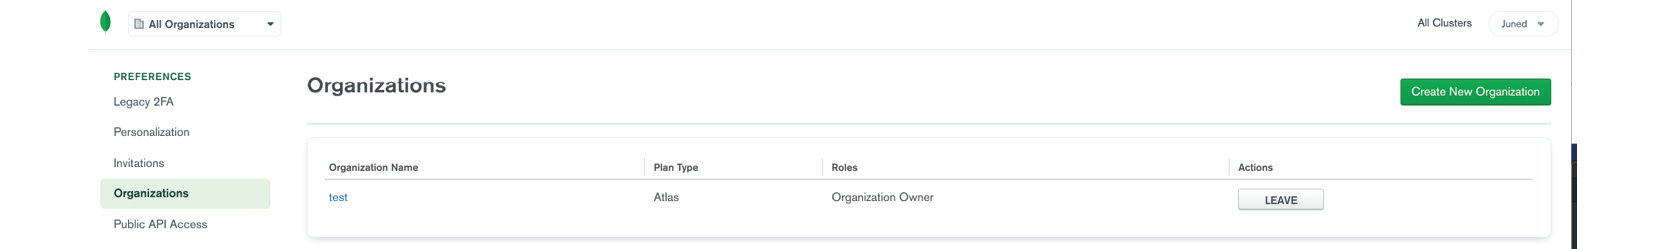 Figure 1.8: Organizations list